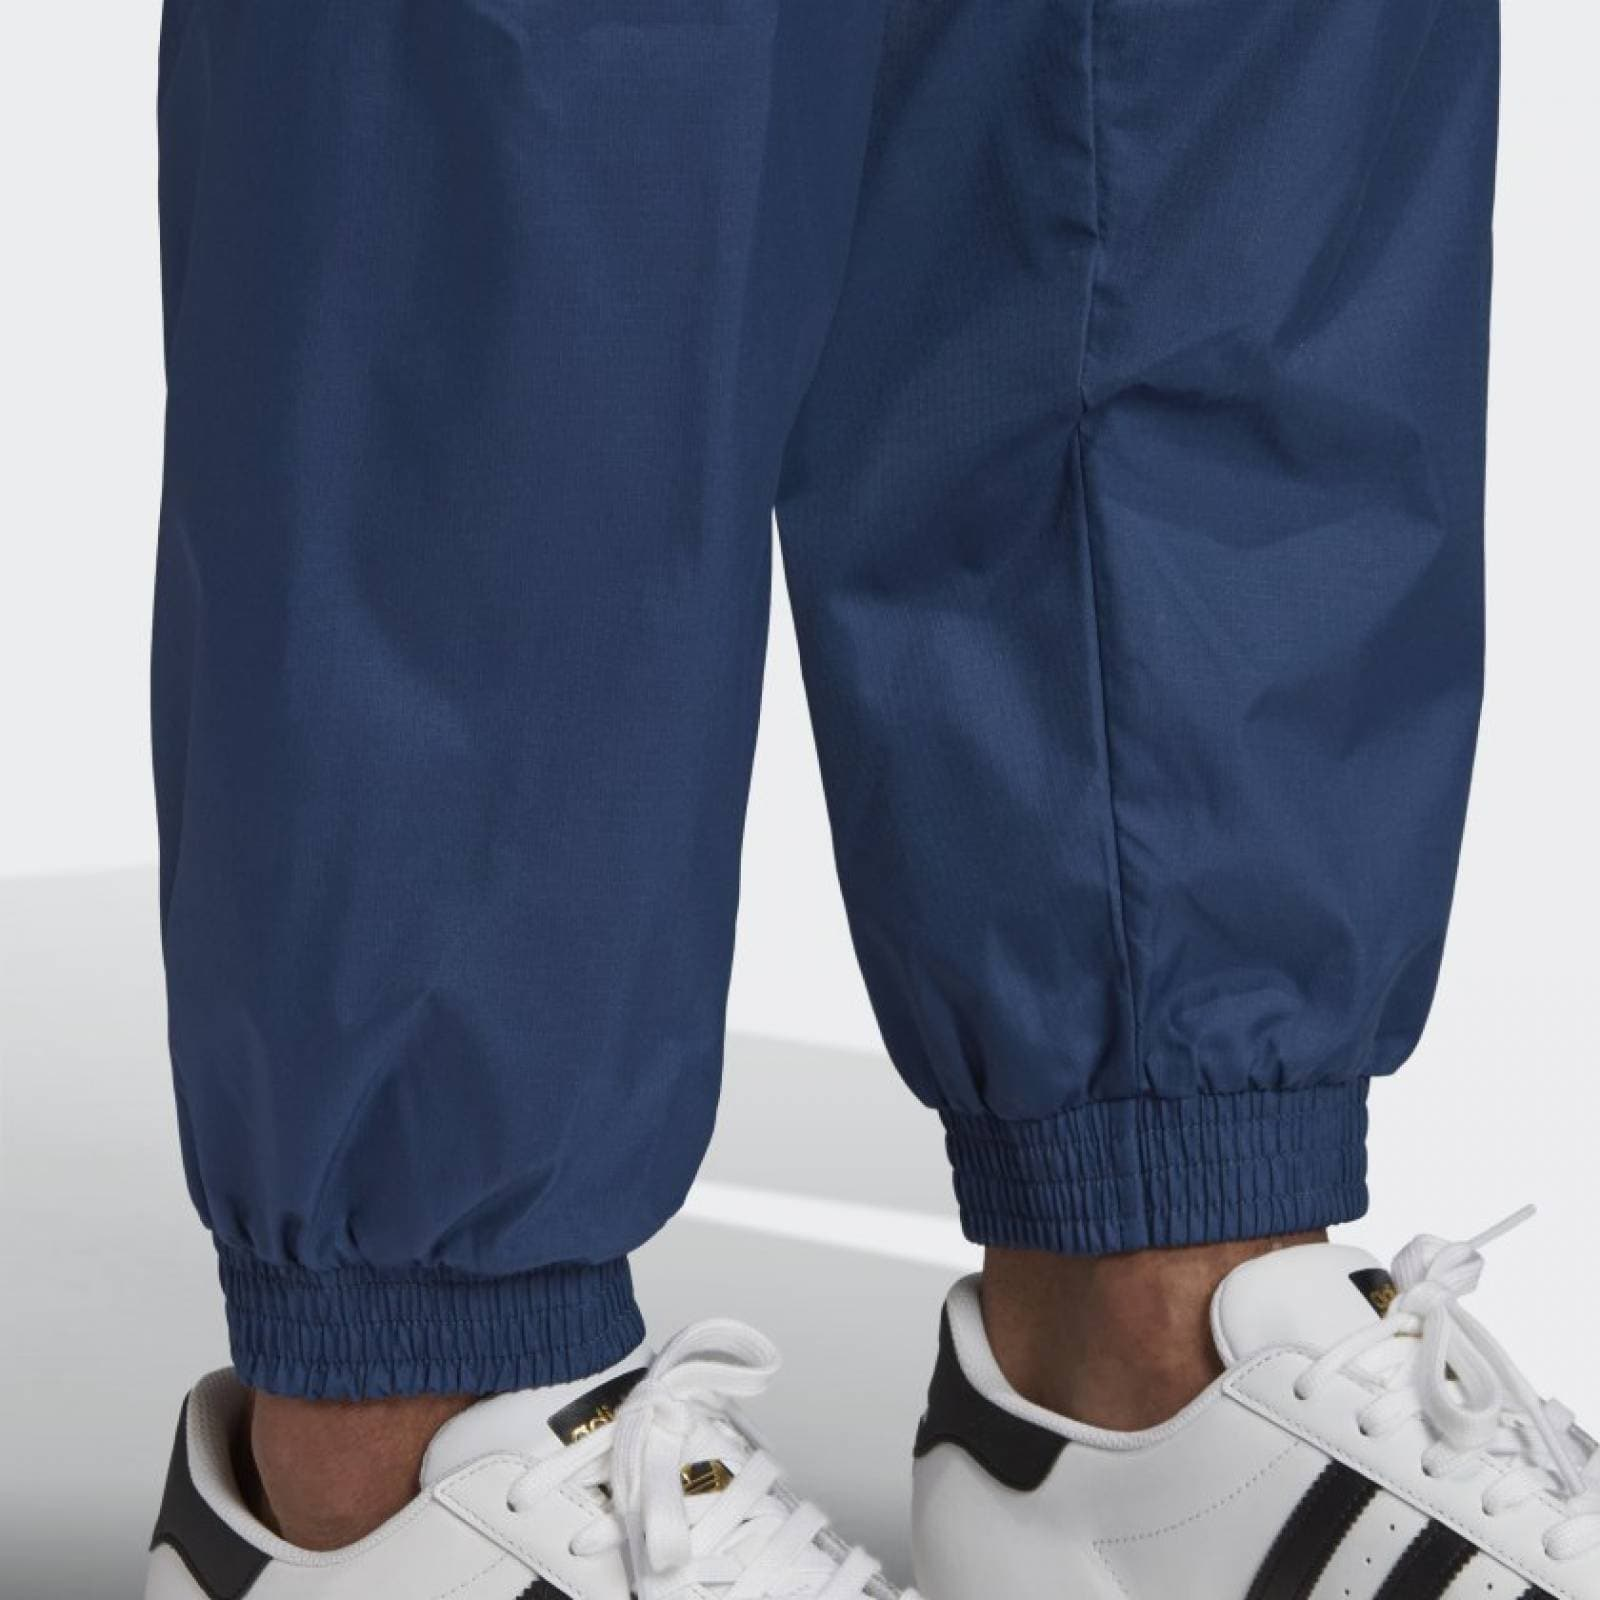 Pants Deportivo Adidas Originals Hombre Trifolio 3 Franjas